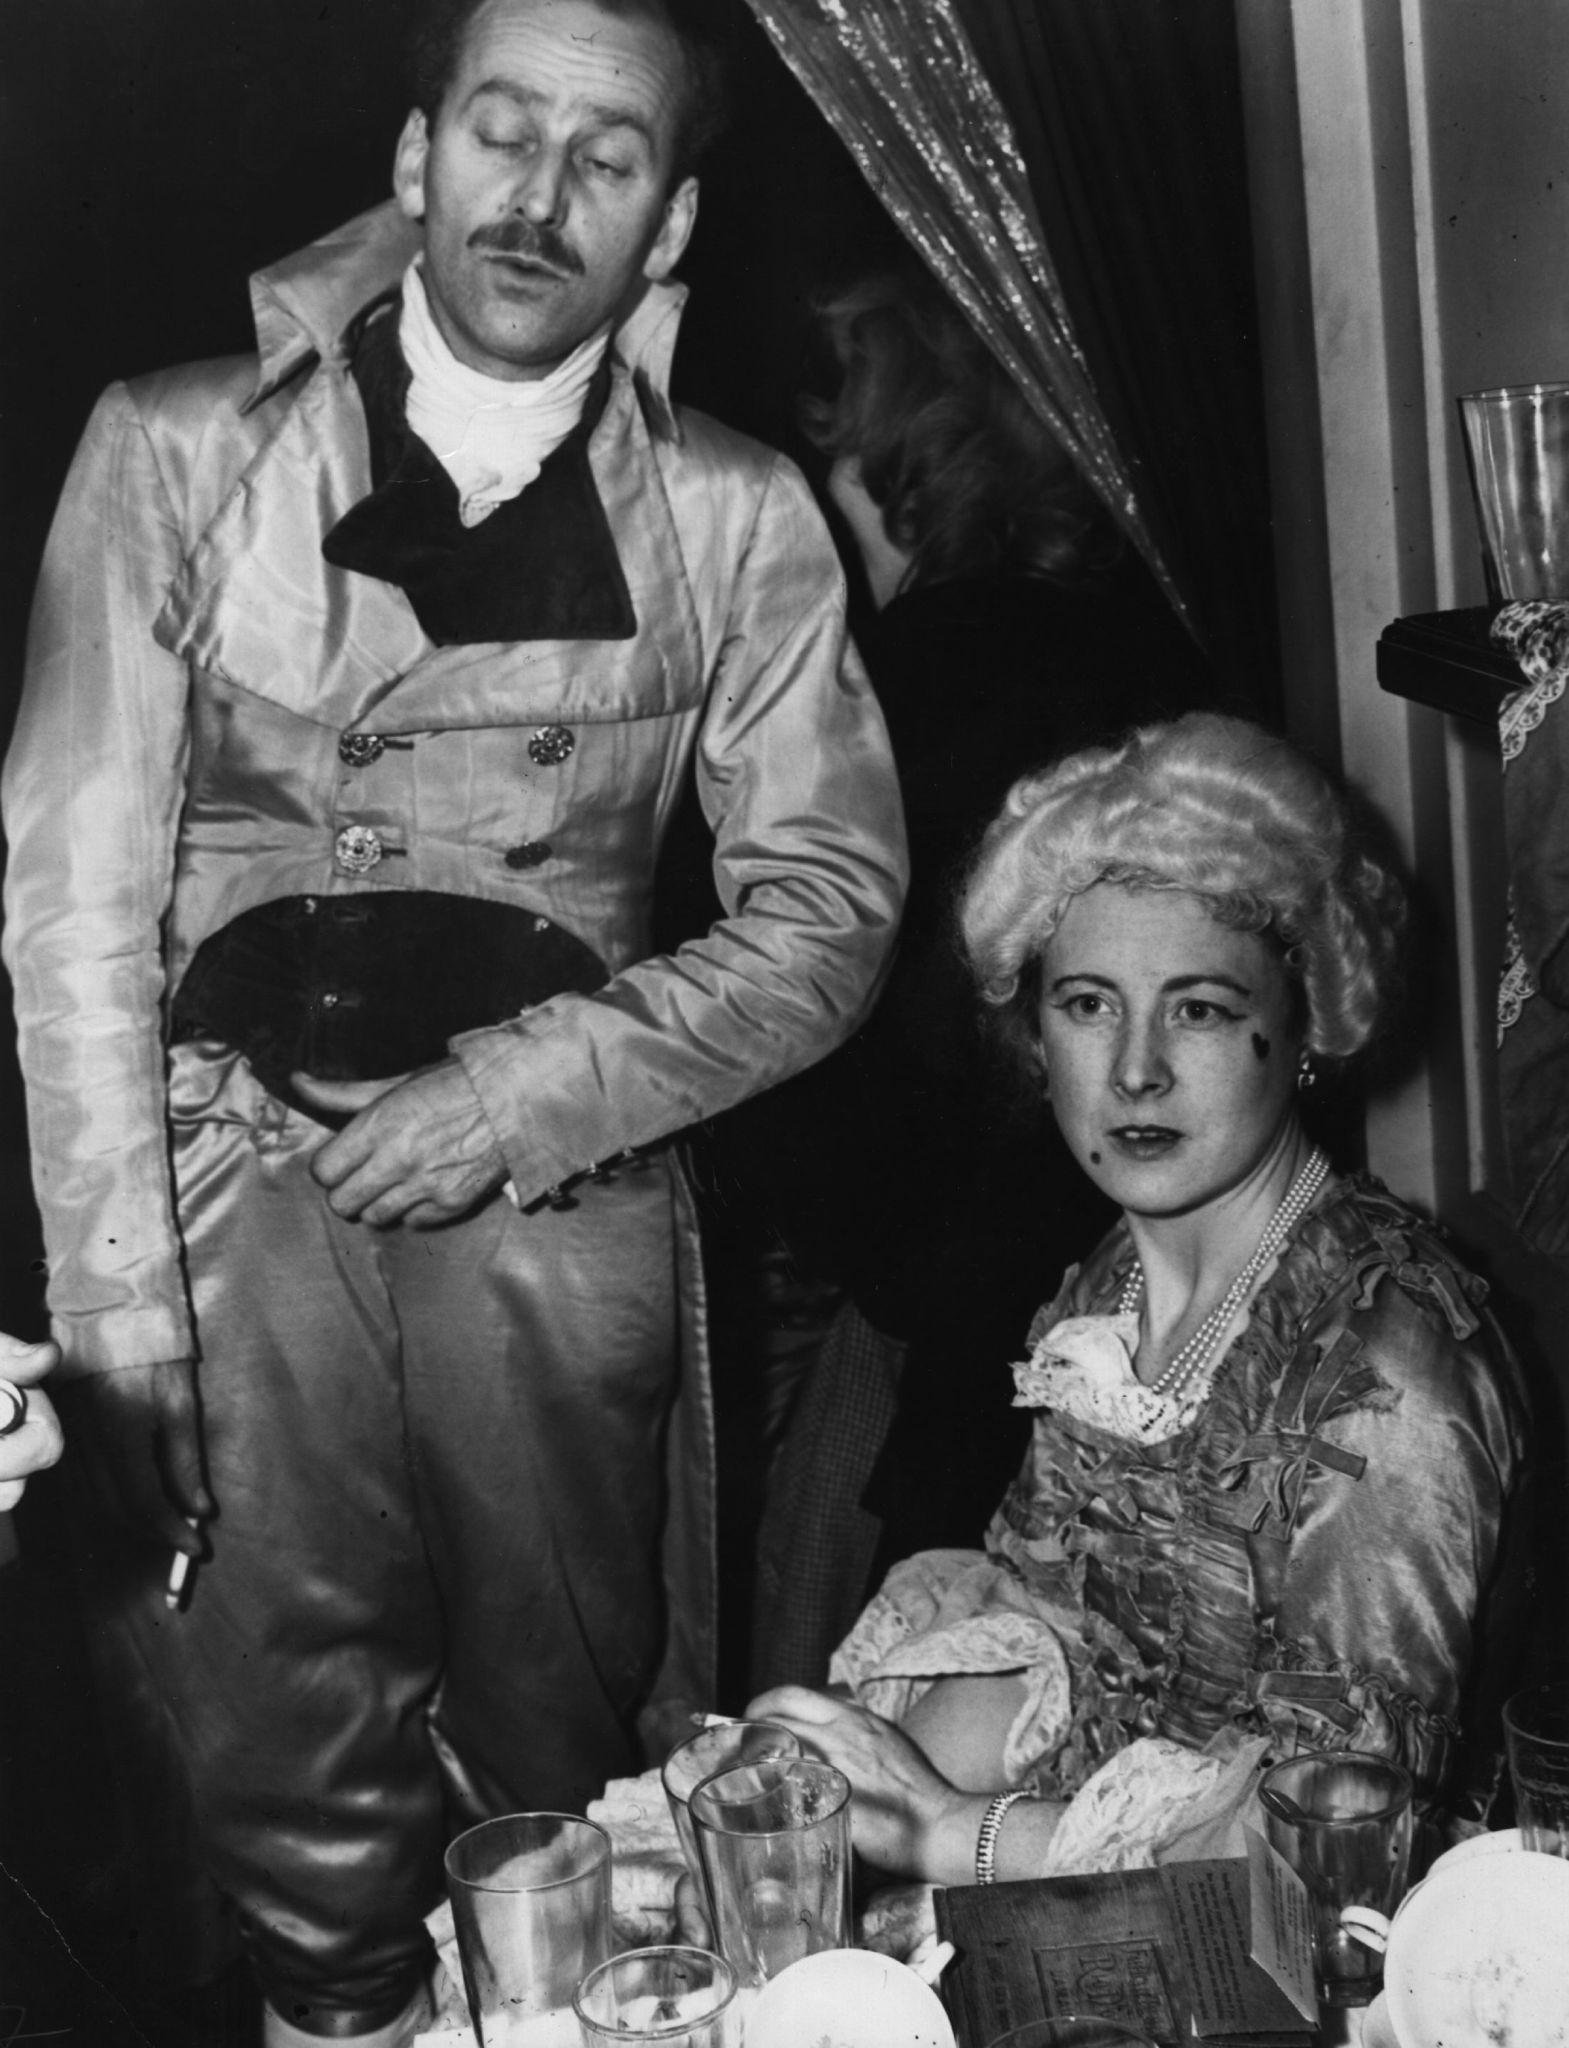 1946. Тед и Барбара Кастлы на Балу искусств, канун Нового года. Н.Й.jpg